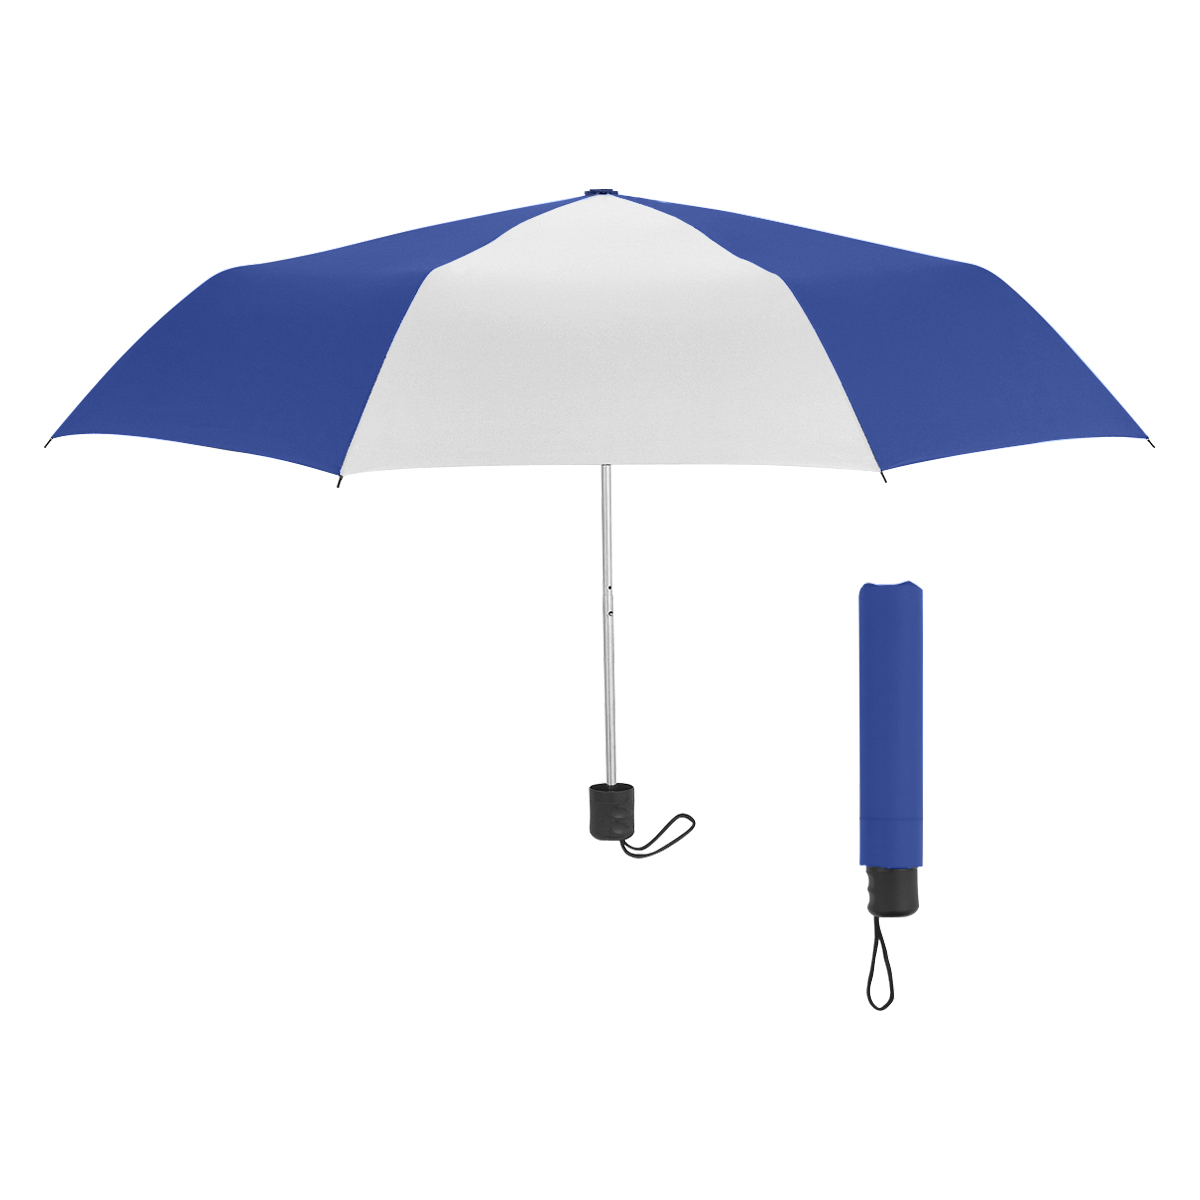 4130 - Paraguas grande